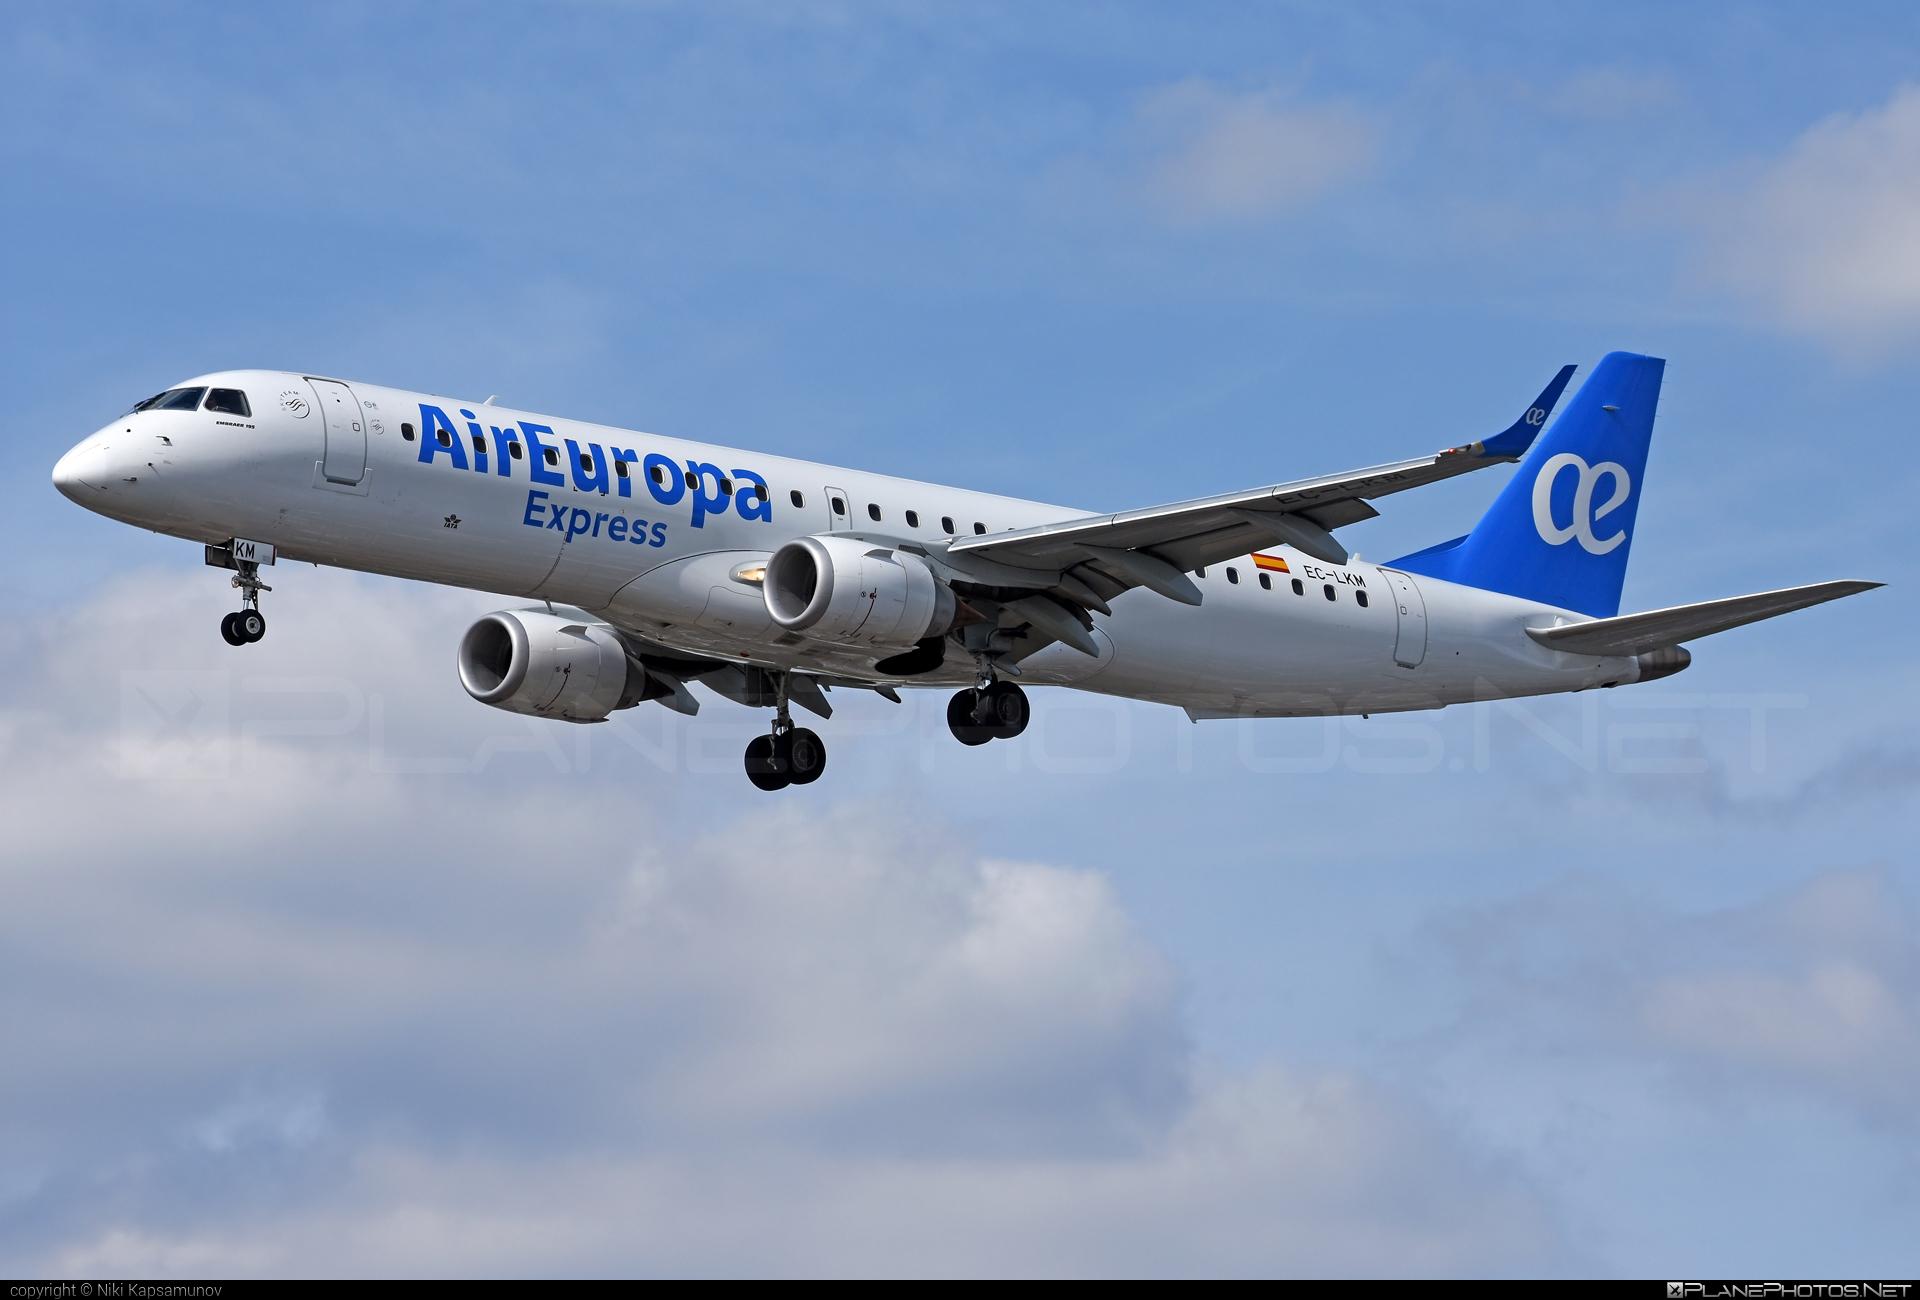 Embraer E195LR (ERJ-190-200LR) - EC-LKM operated by Air Europa Express #e190 #e190200 #e190200lr #e195lr #embraer #embraer190200lr #embraer195 #embraer195lr